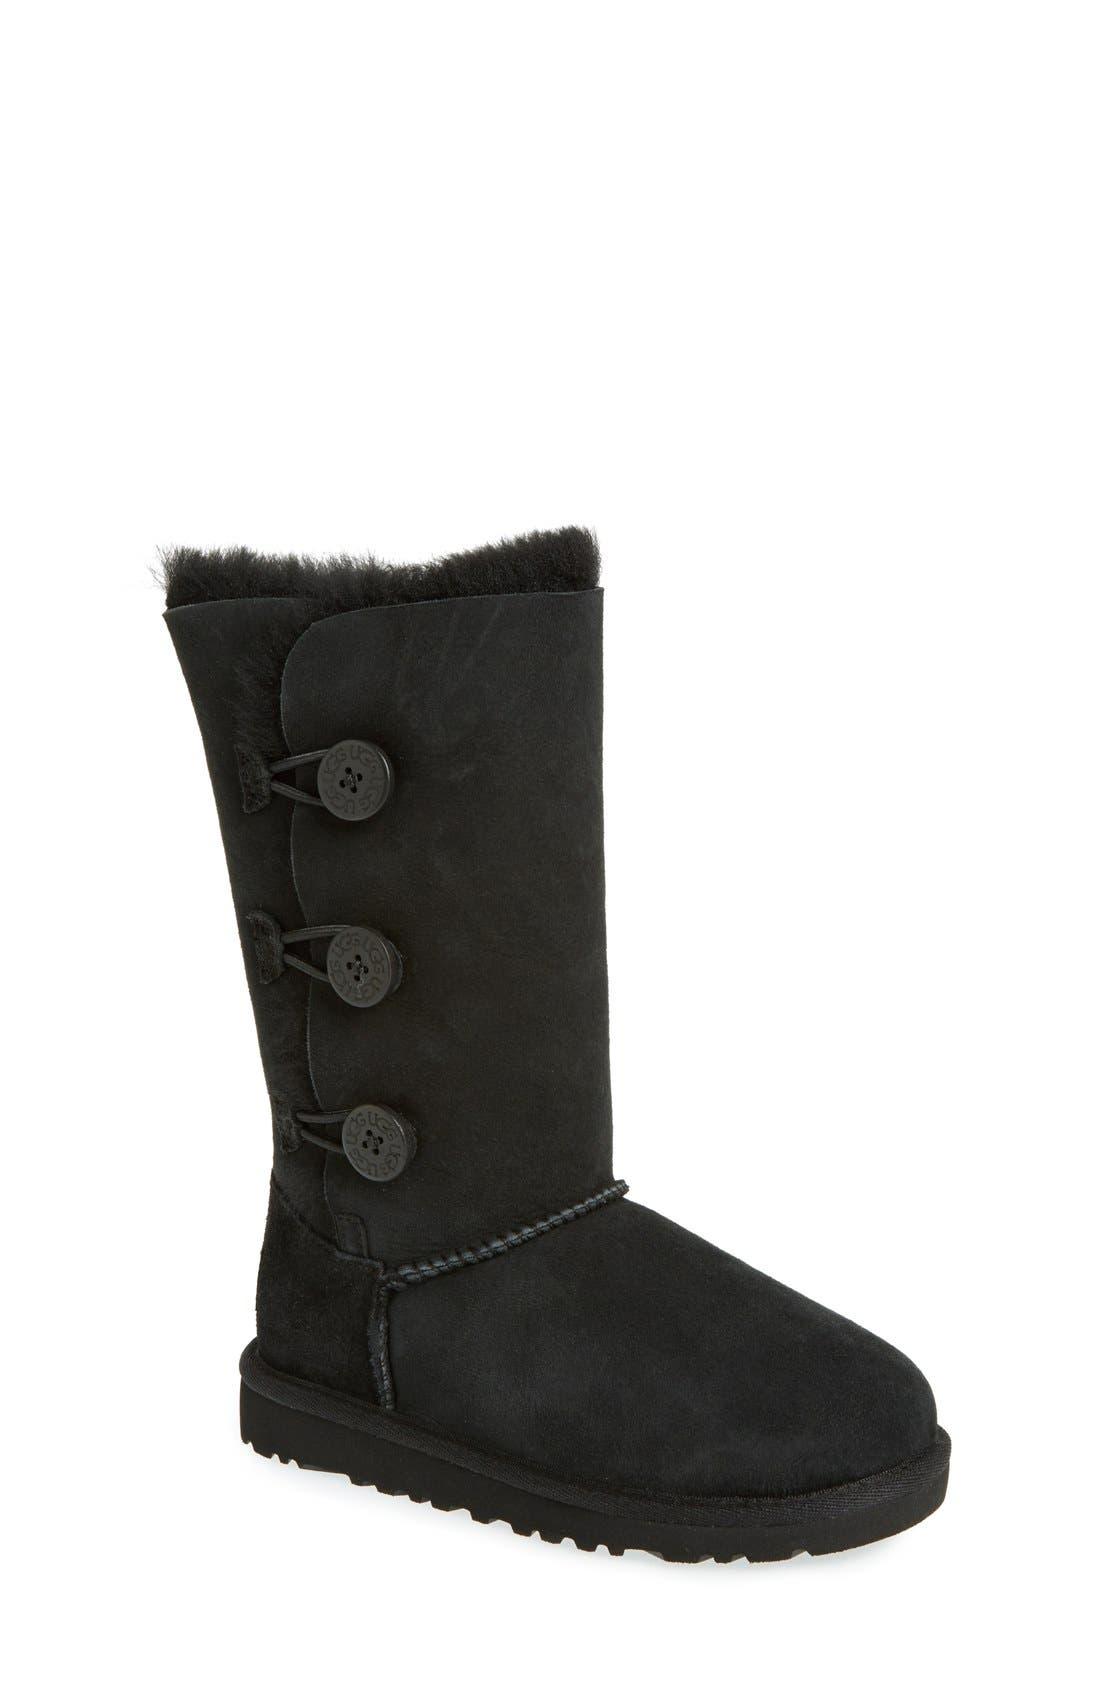 'Bailey Button Triplet' Boot, Main, color, 001